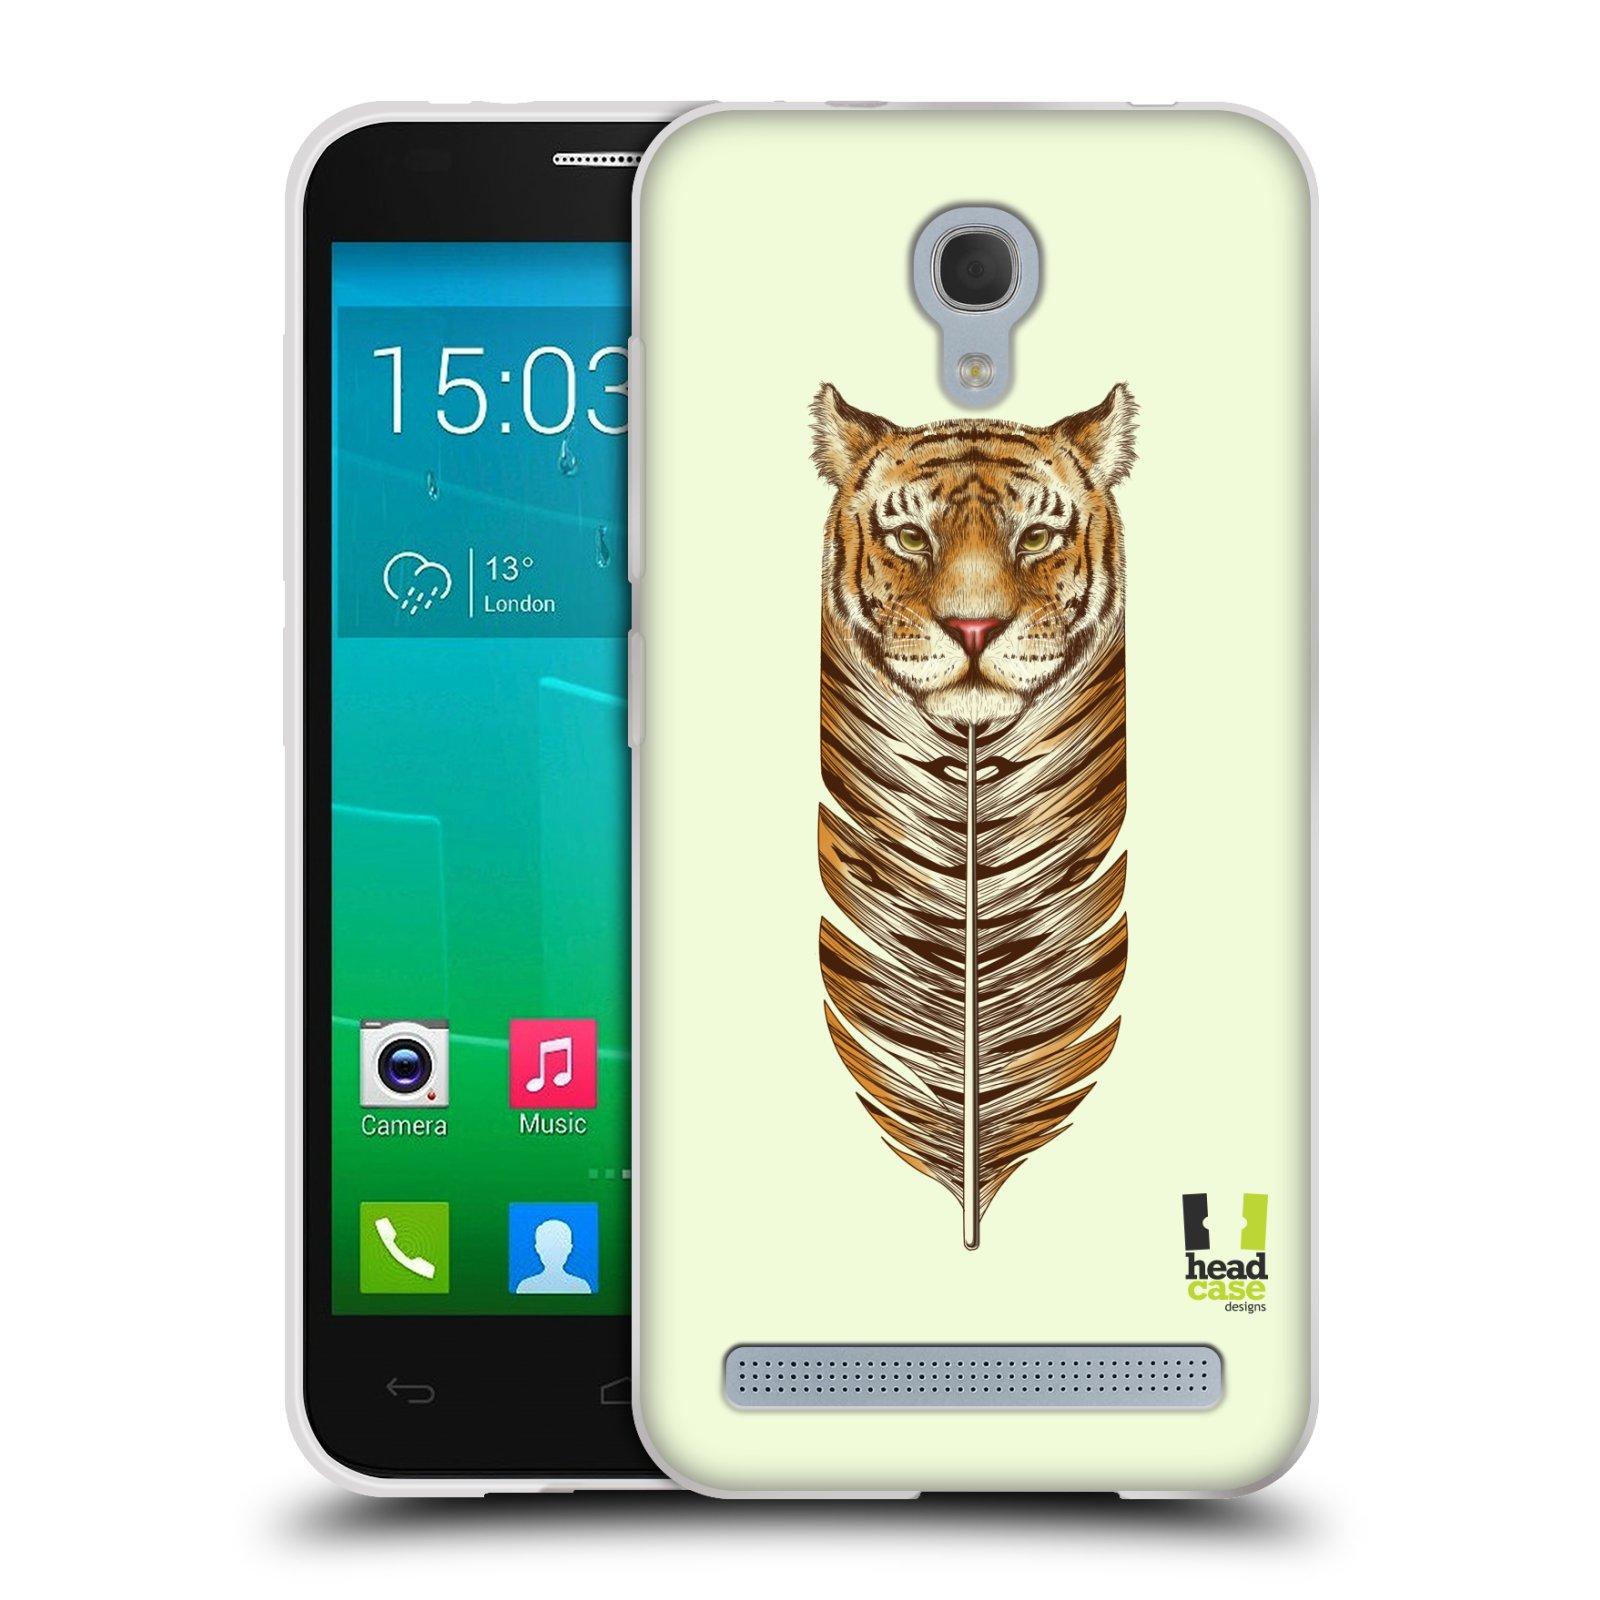 Silikonové pouzdro na mobil Alcatel One Touch Idol 2 Mini S 6036Y HEAD CASE PÍRKO TYGR (Silikonový kryt či obal na mobilní telefon Alcatel Idol 2 Mini S OT-6036Y)